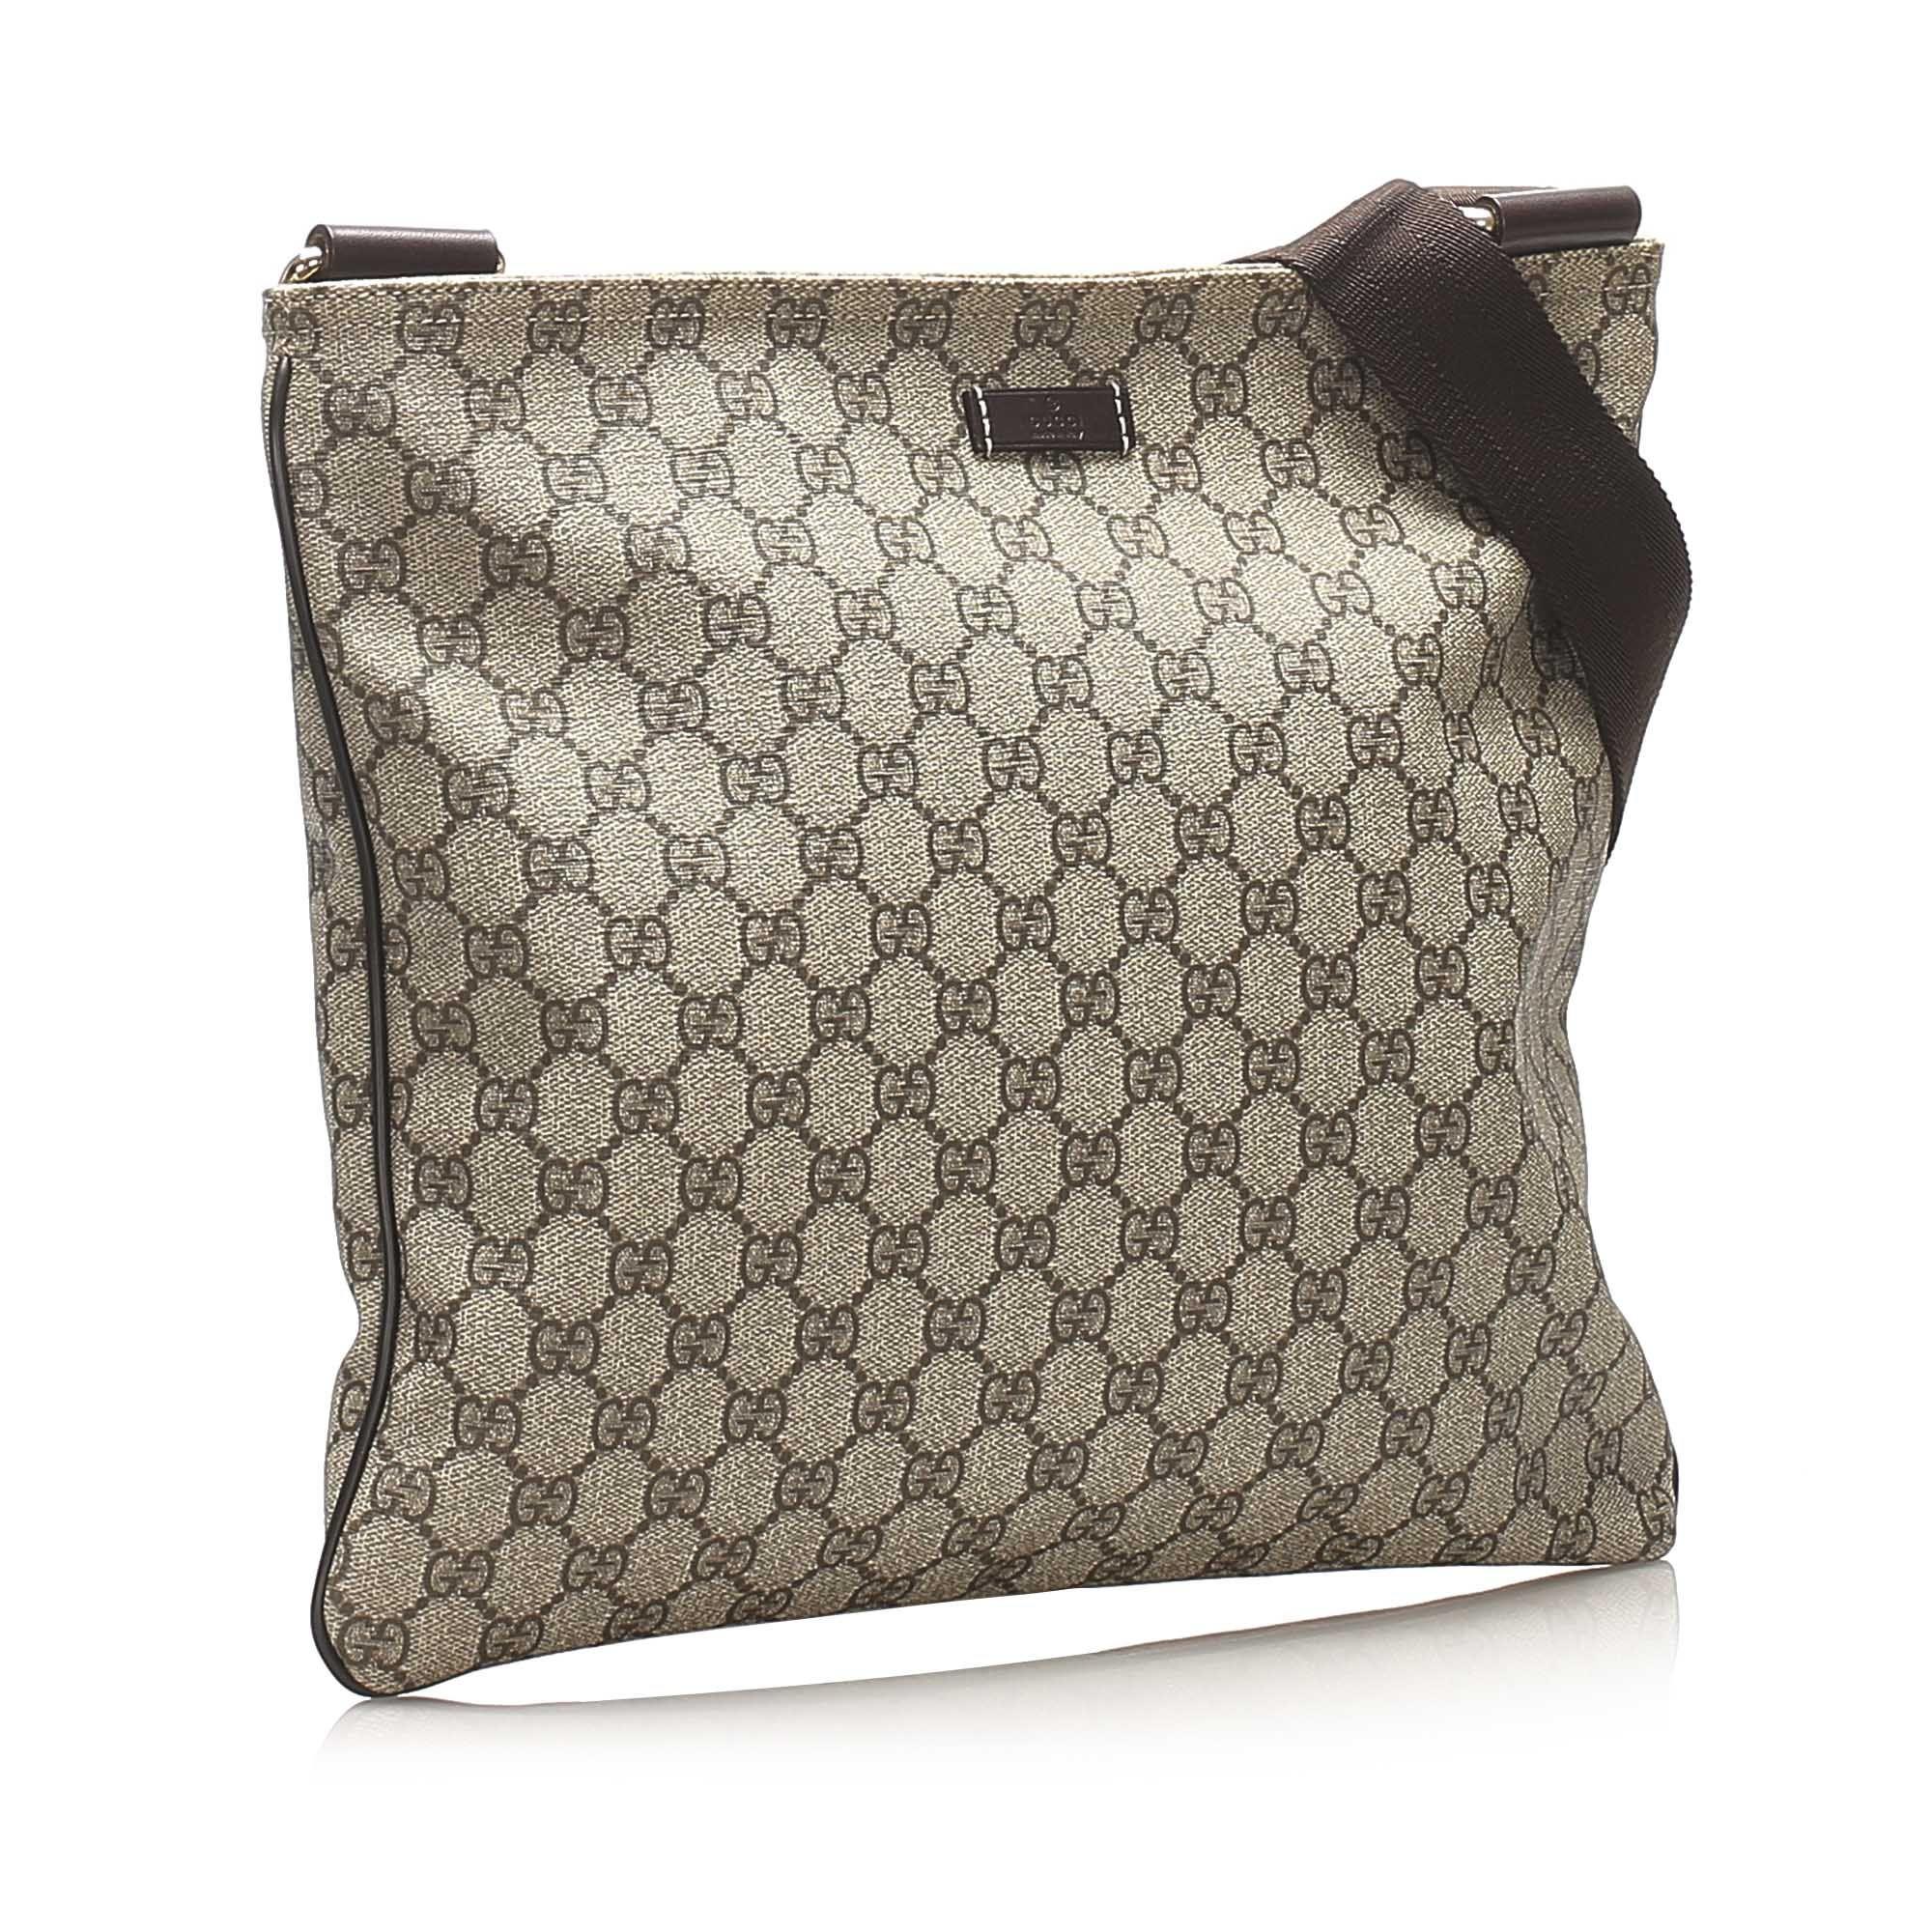 Vintage Gucci GG Supreme Crossbody Bag Brown